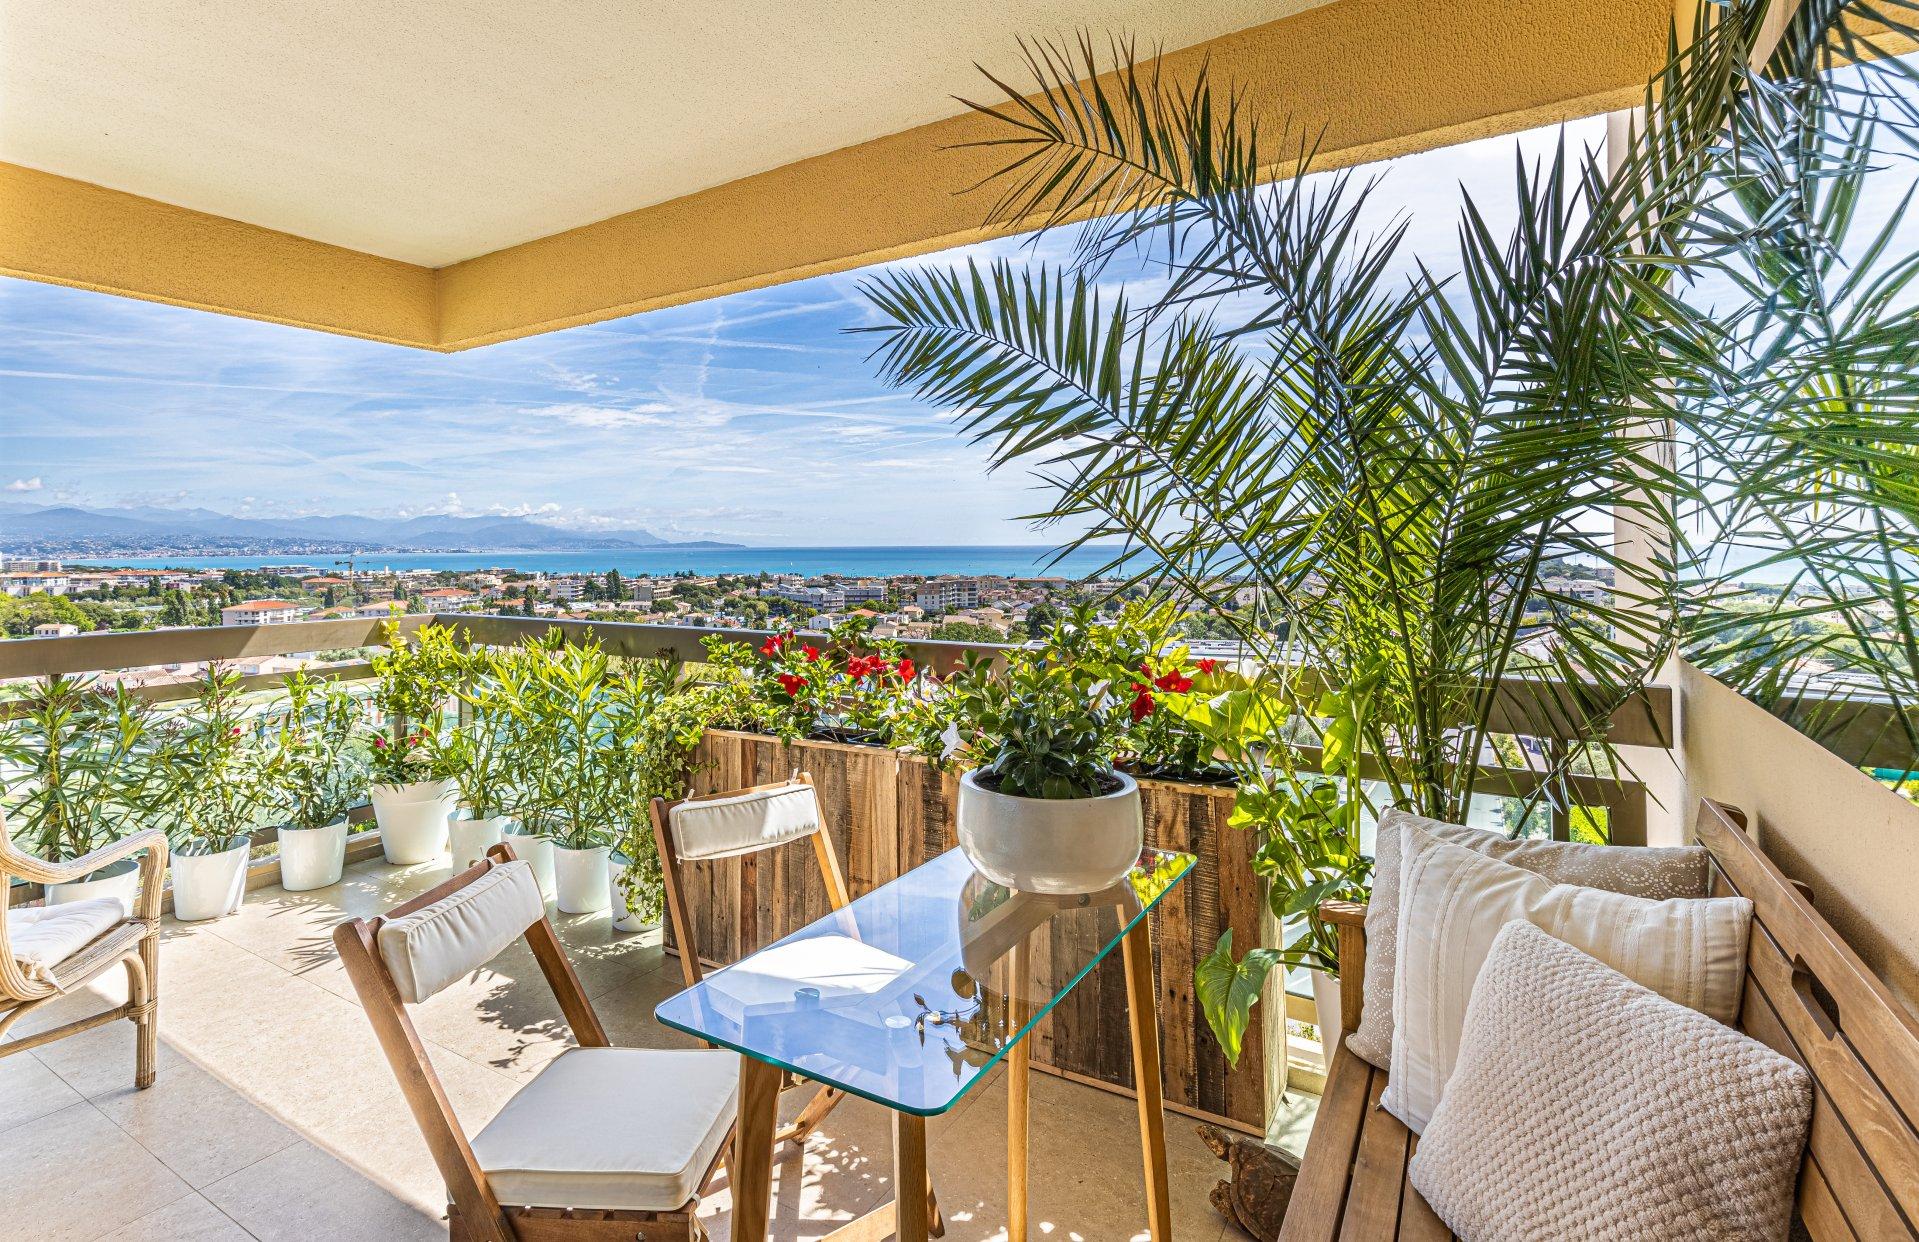 Beautiful top floor 1-bed apartment, 3 terraces, panoramic sea view in Antibes